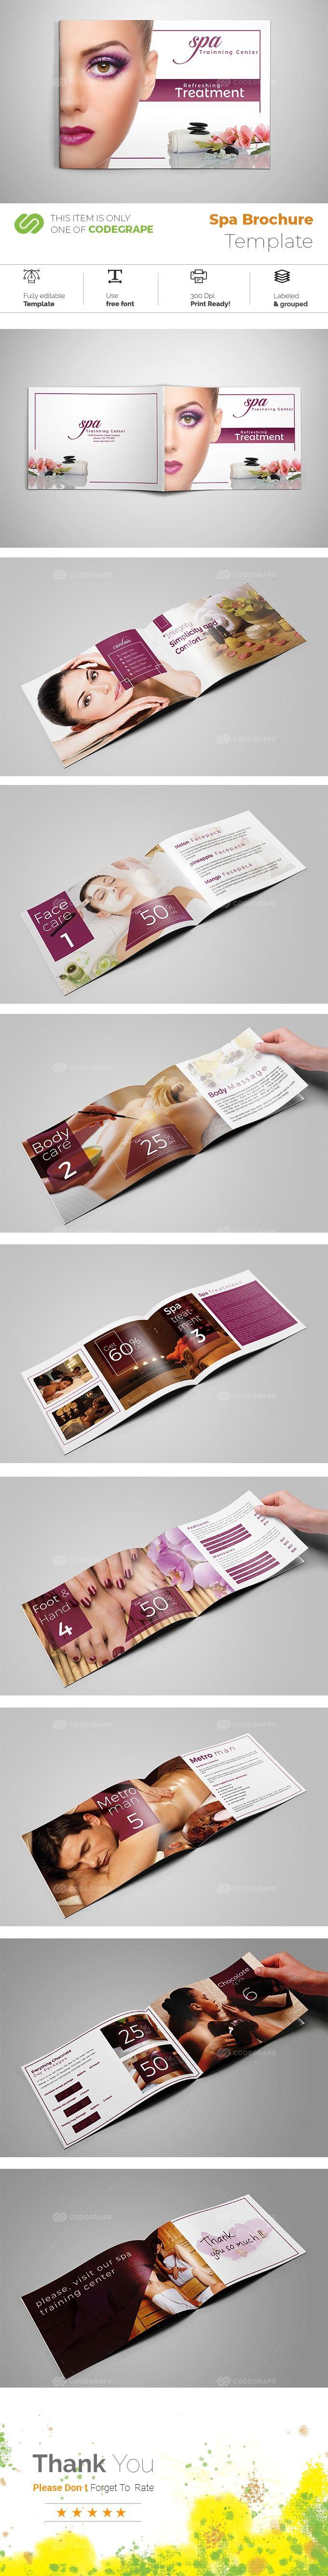 Spa Brochure on @codegrape. More Info: https://www.codegrape.com/item/spa-brochure/19006